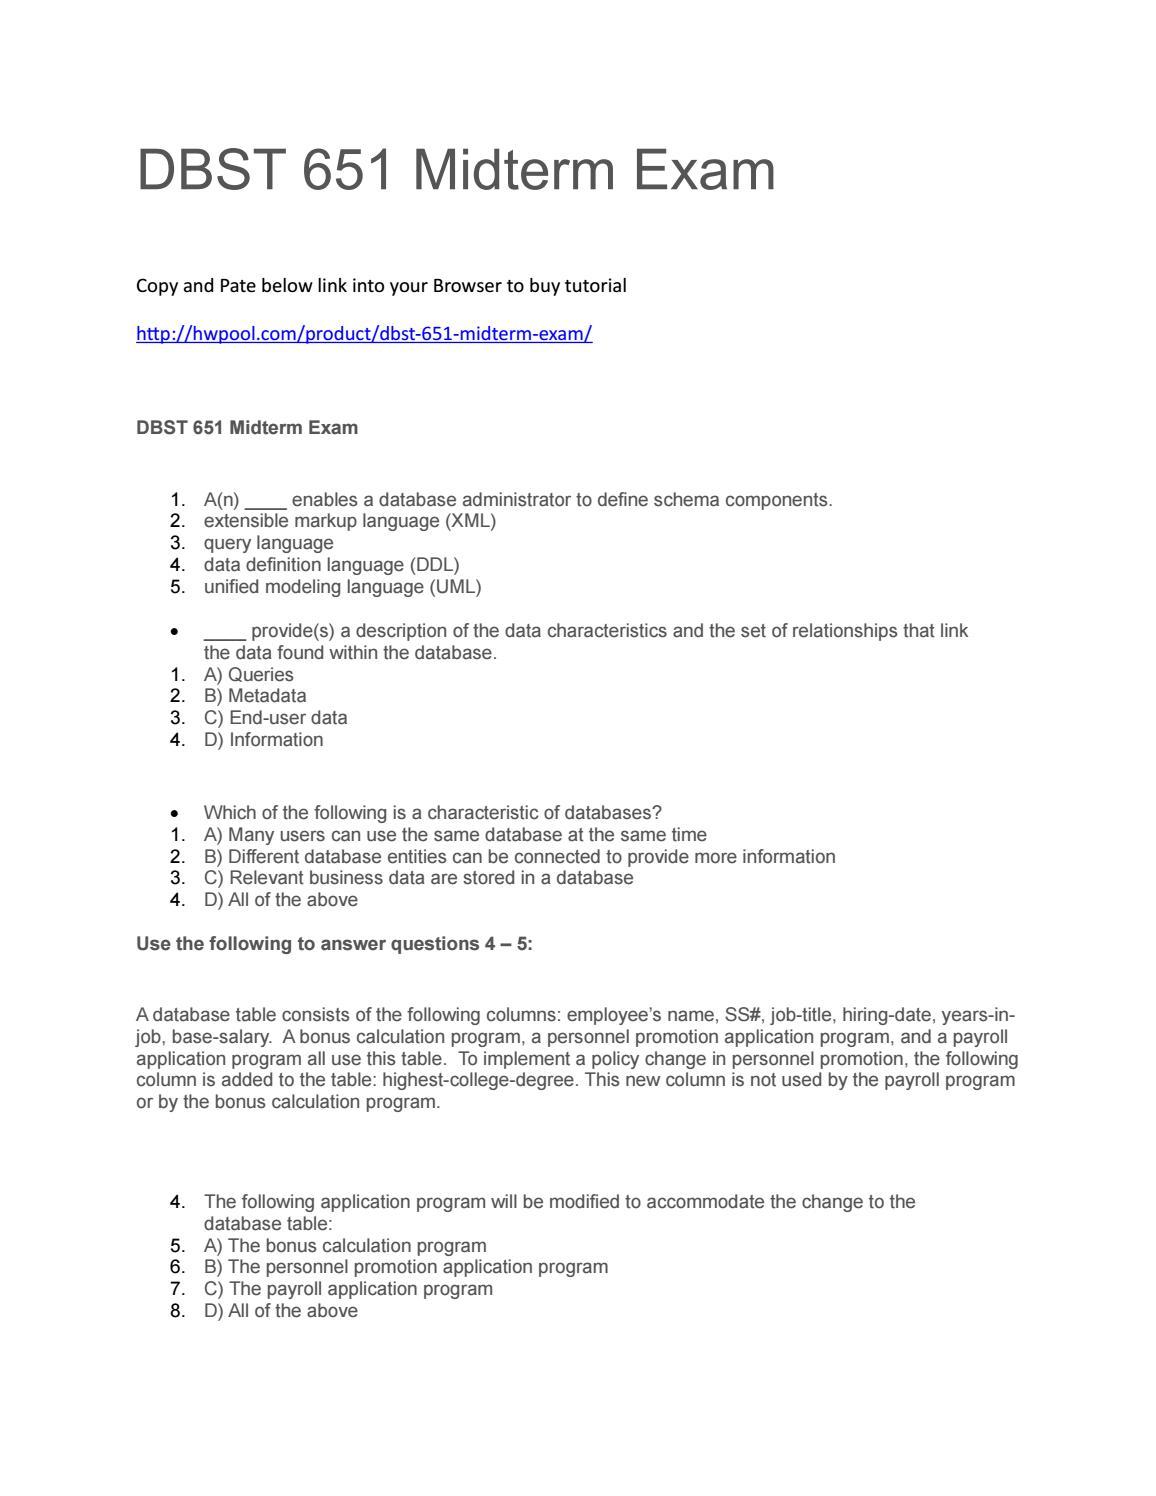 Dbst 651 midterm exam by Patrickdavis11 - issuu